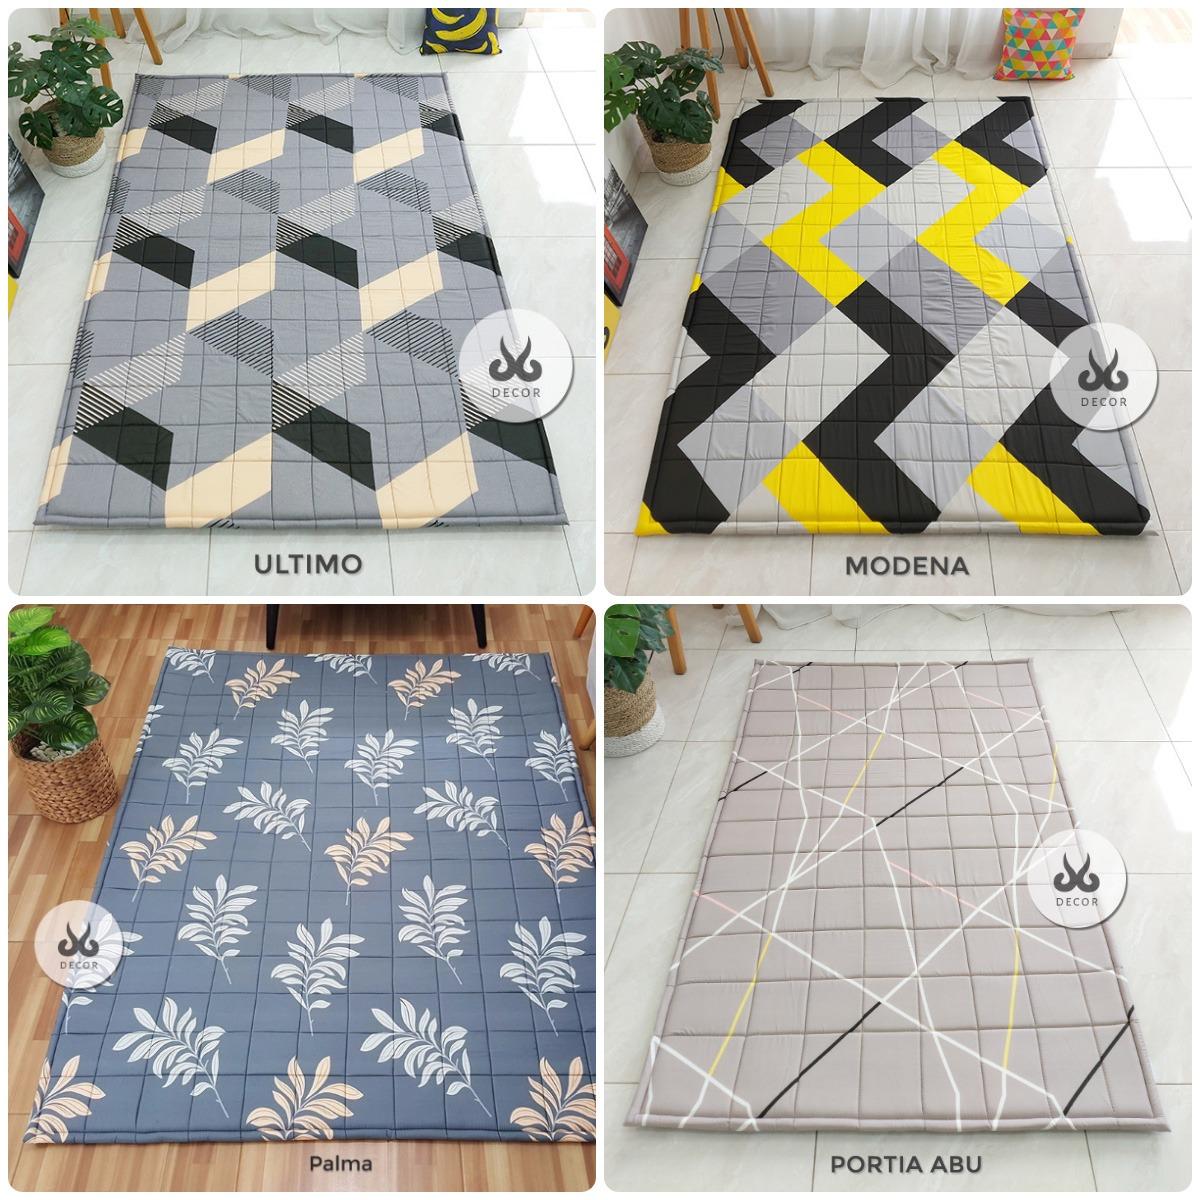 Karpet-Bahan-Katun-Dengan-busa-dan-alas-bintik-anti-slip-di-bagian-bawahnya-Ultimo-Modena-Palma-Portia-Abu-1